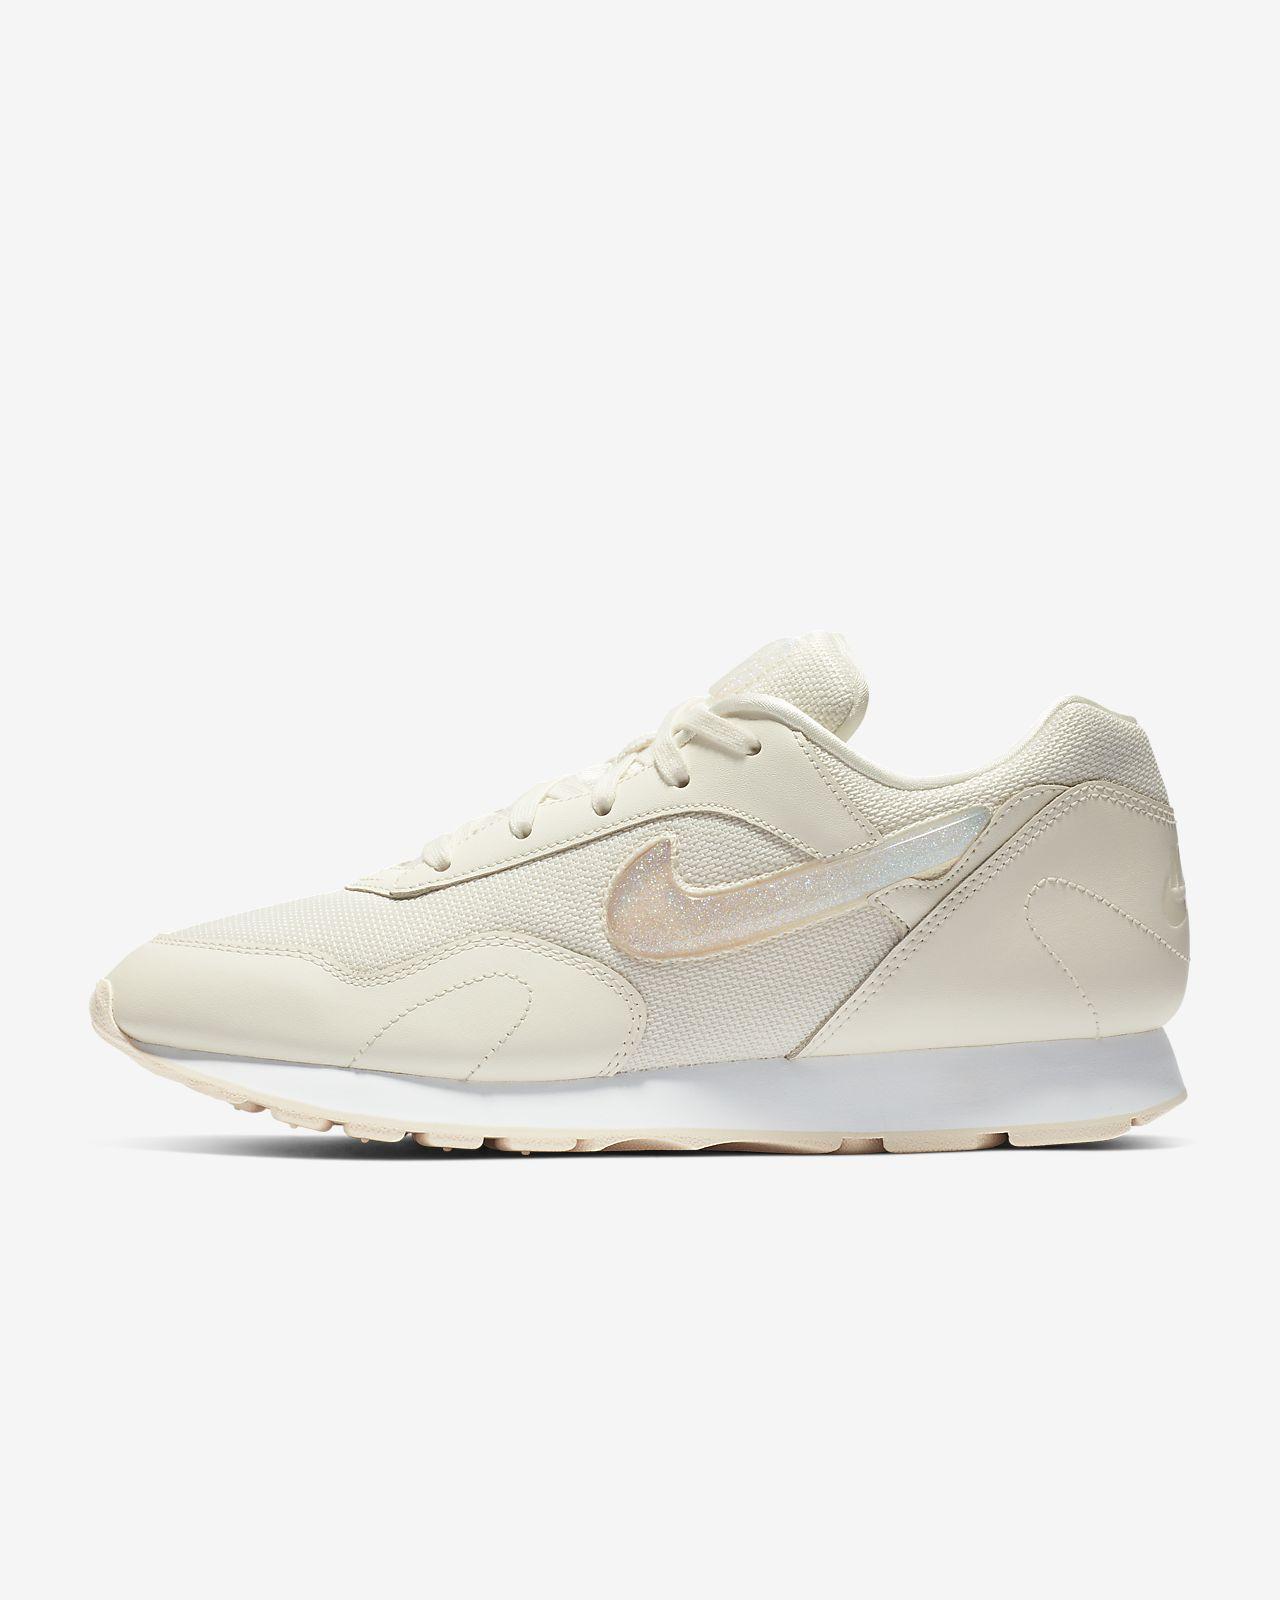 7e0eda34d48 Nike Outburst Premium Women s Shoe. Nike.com ID